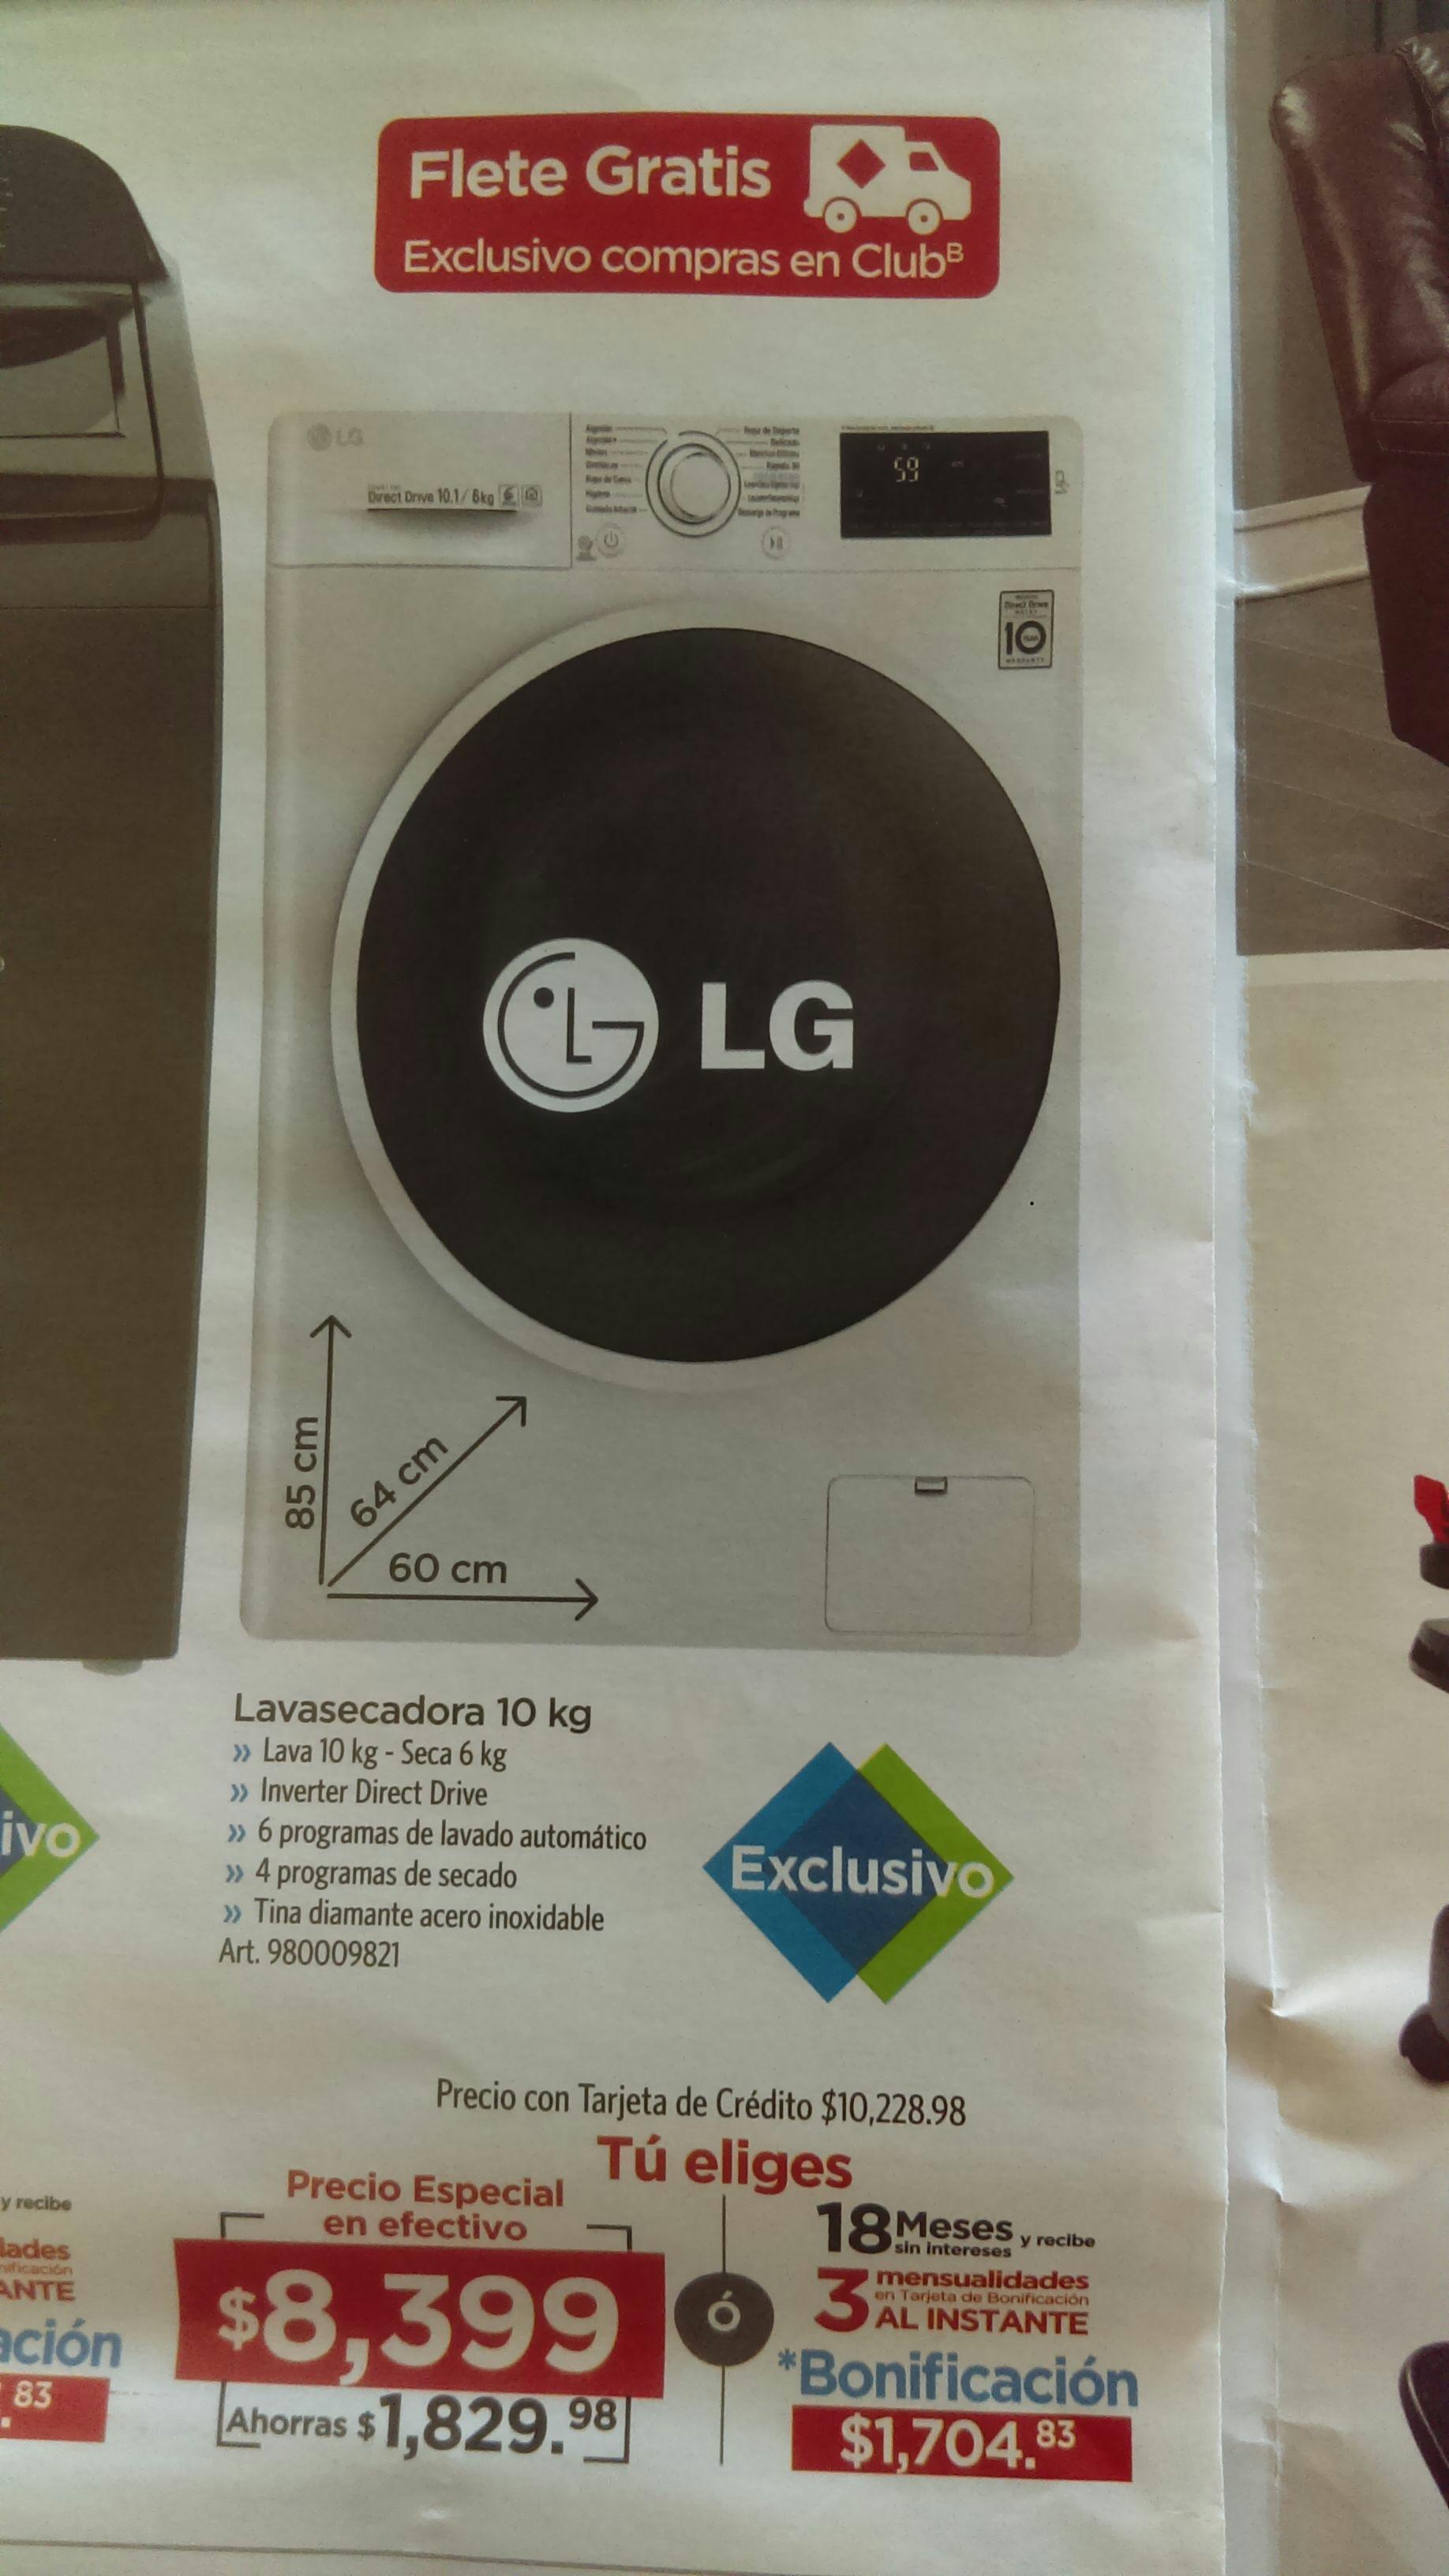 SAM'S CLUB Online Buen Fin: Lavasecadora LG C4 Carga Frontal 10 kg